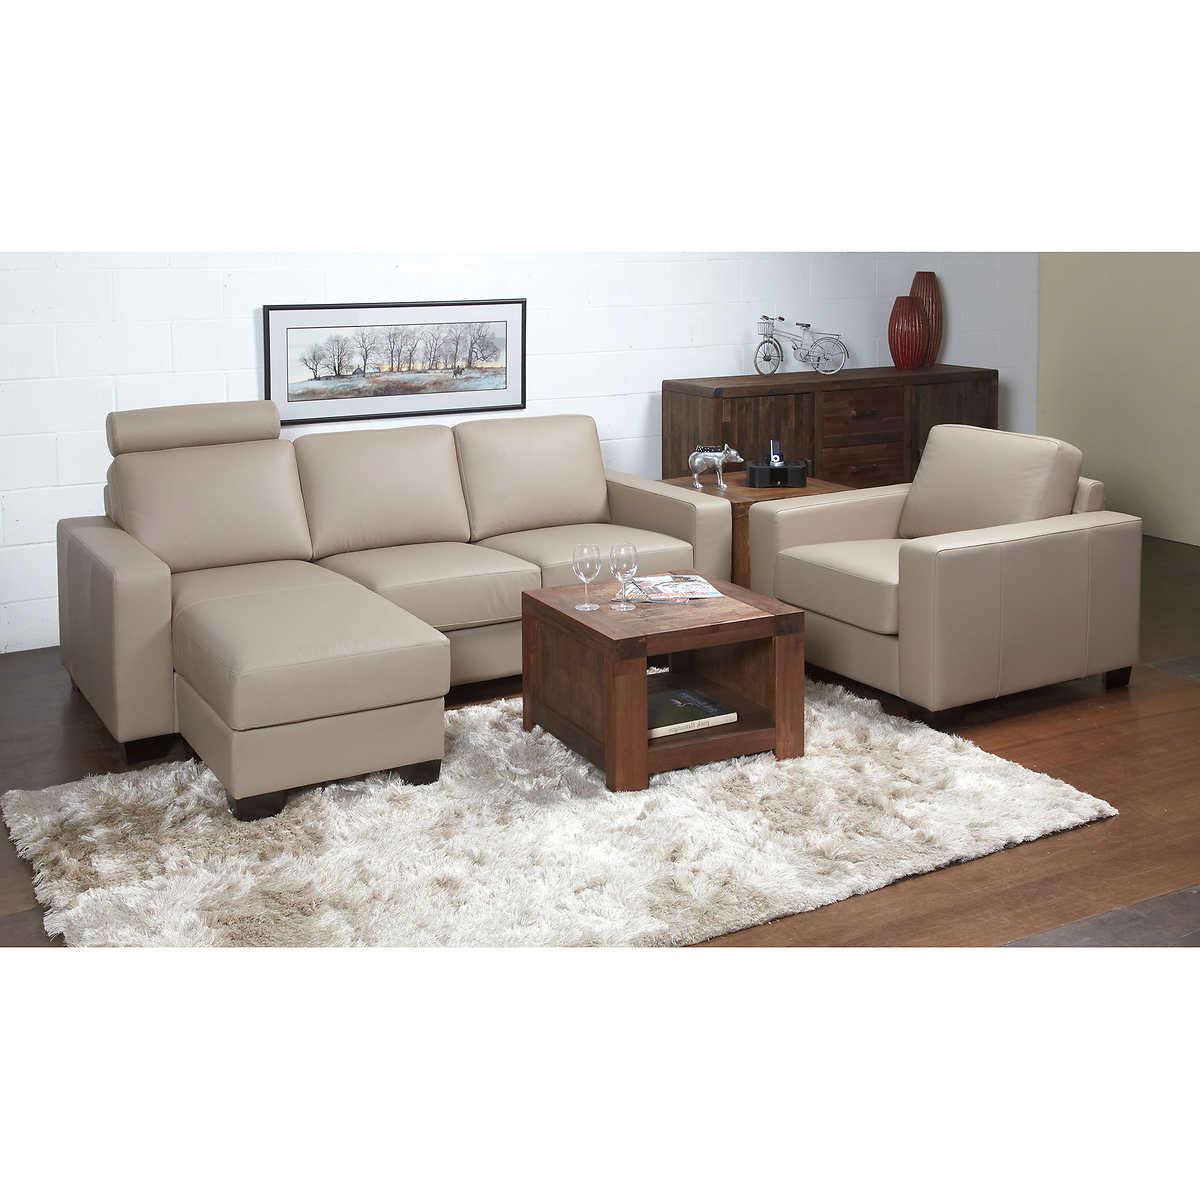 Palliser Sofa Review Images Reviews Rooms